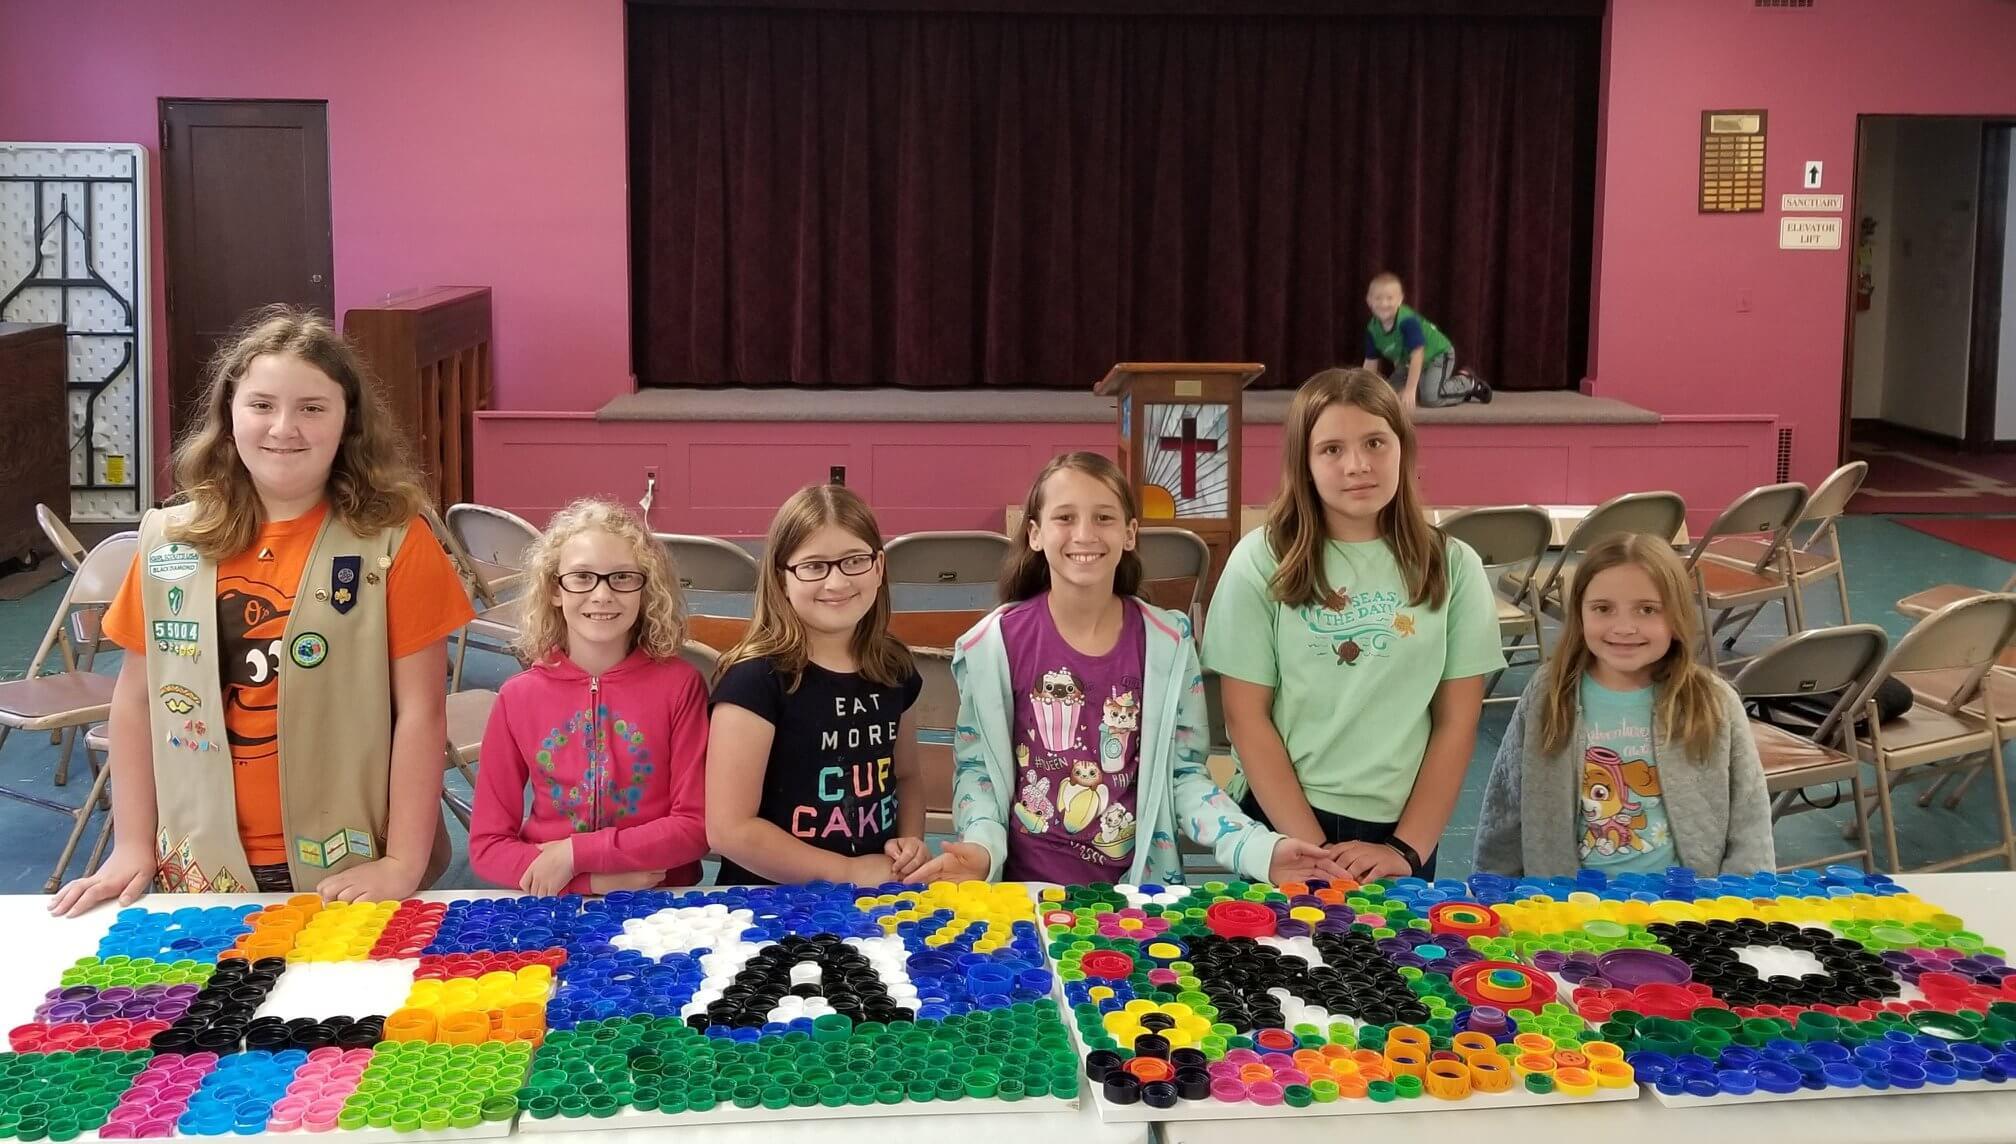 Girlscouts Bottle cap Project